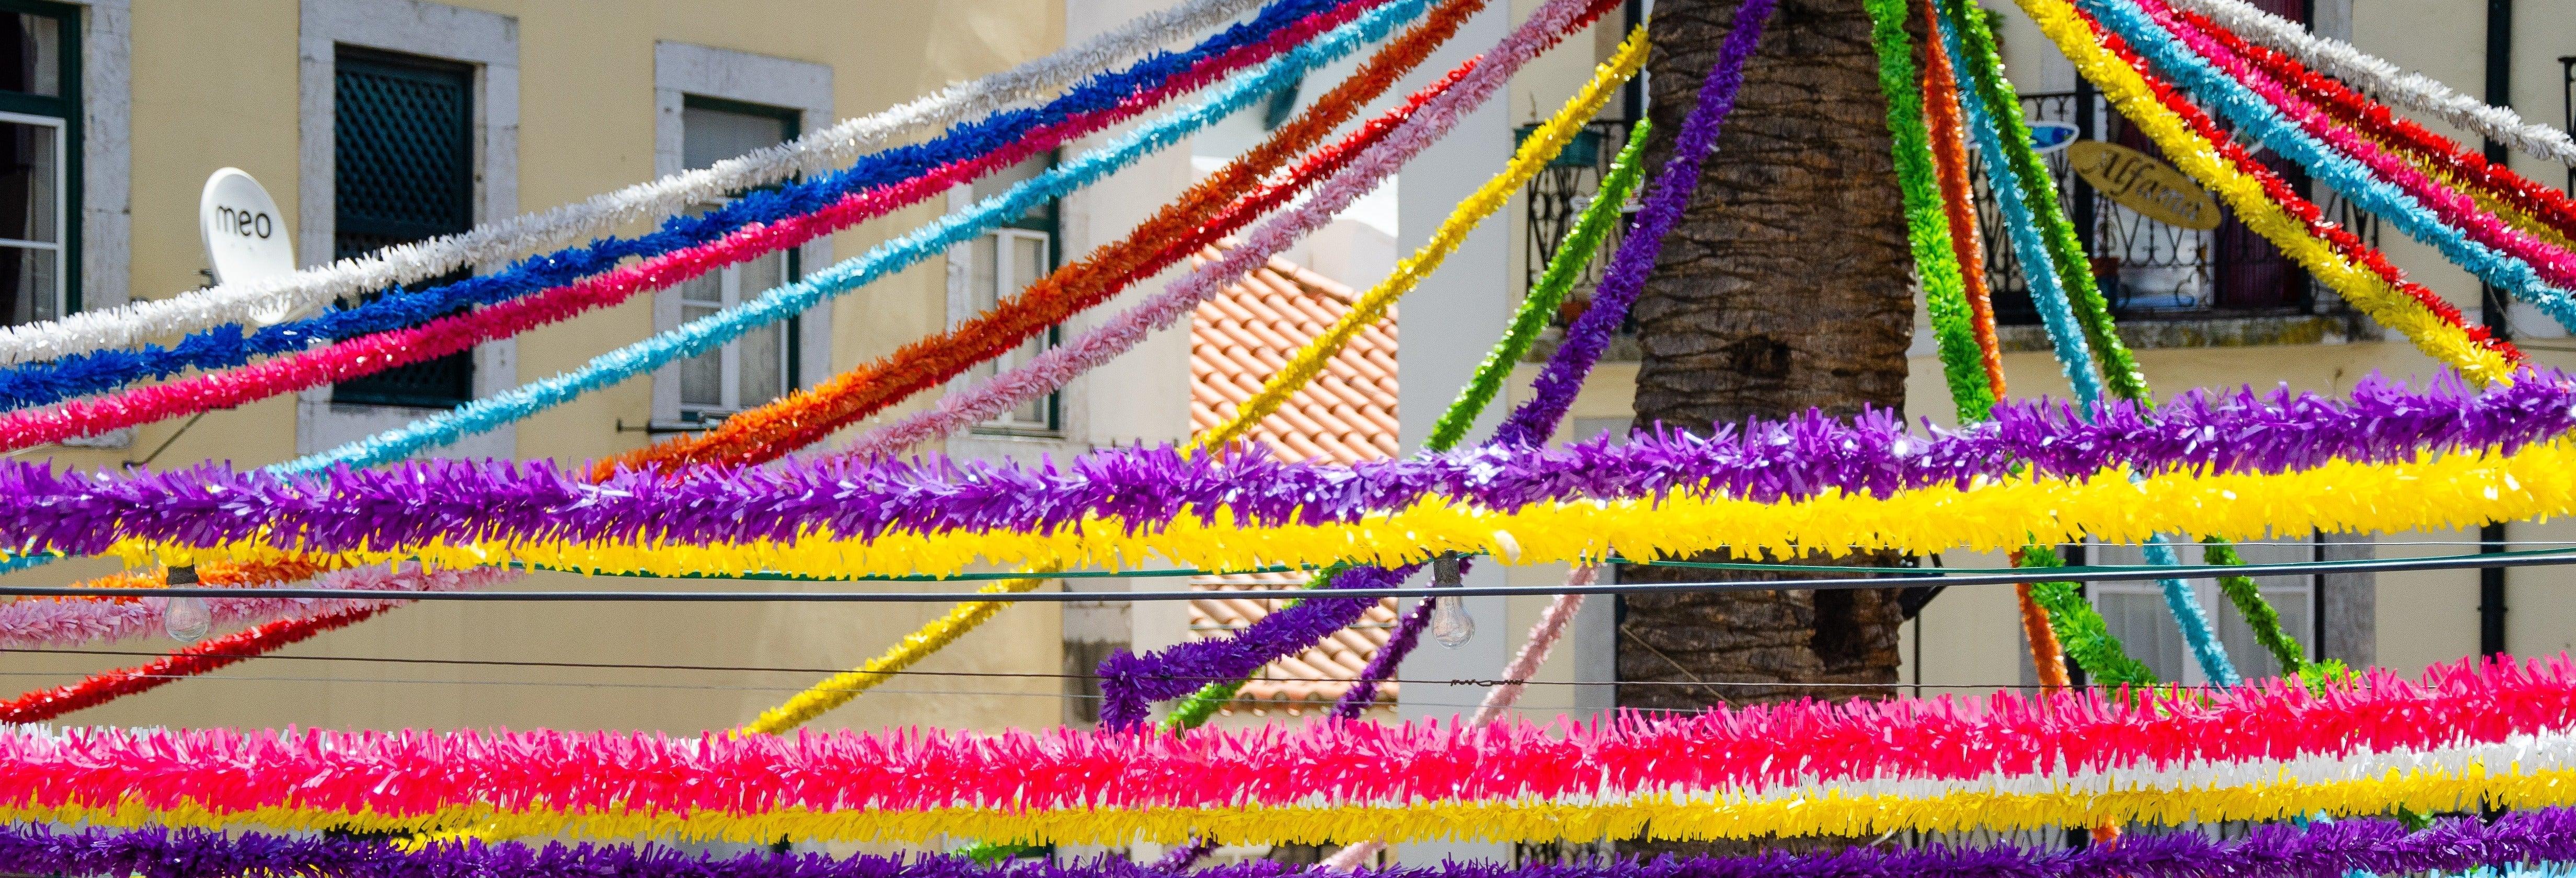 Free tour del fado a Lisbona